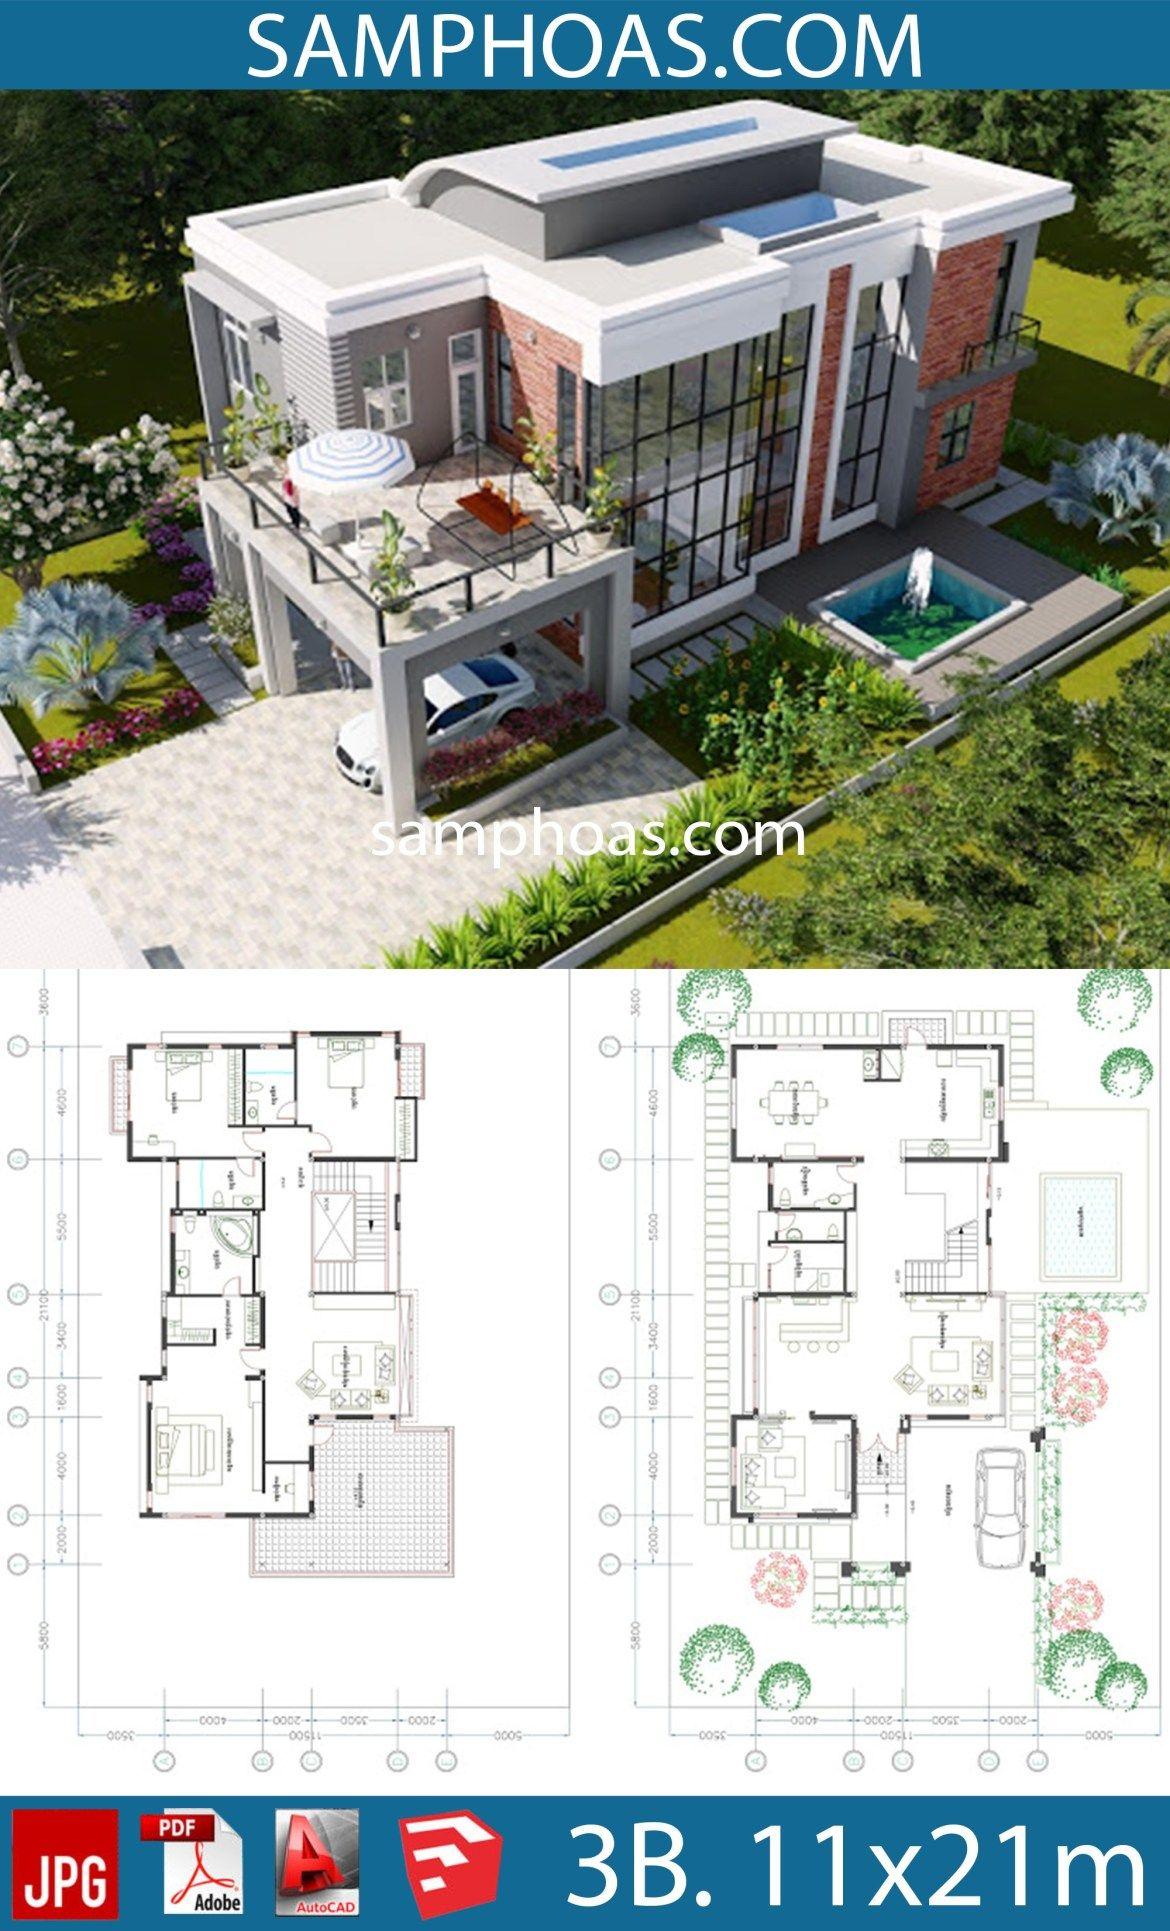 3 Bedroom Modern Villa Design Size 11 5x21 1m Samphoas Plansearch Architecture Model House Modern Villa Design Sims House Plans